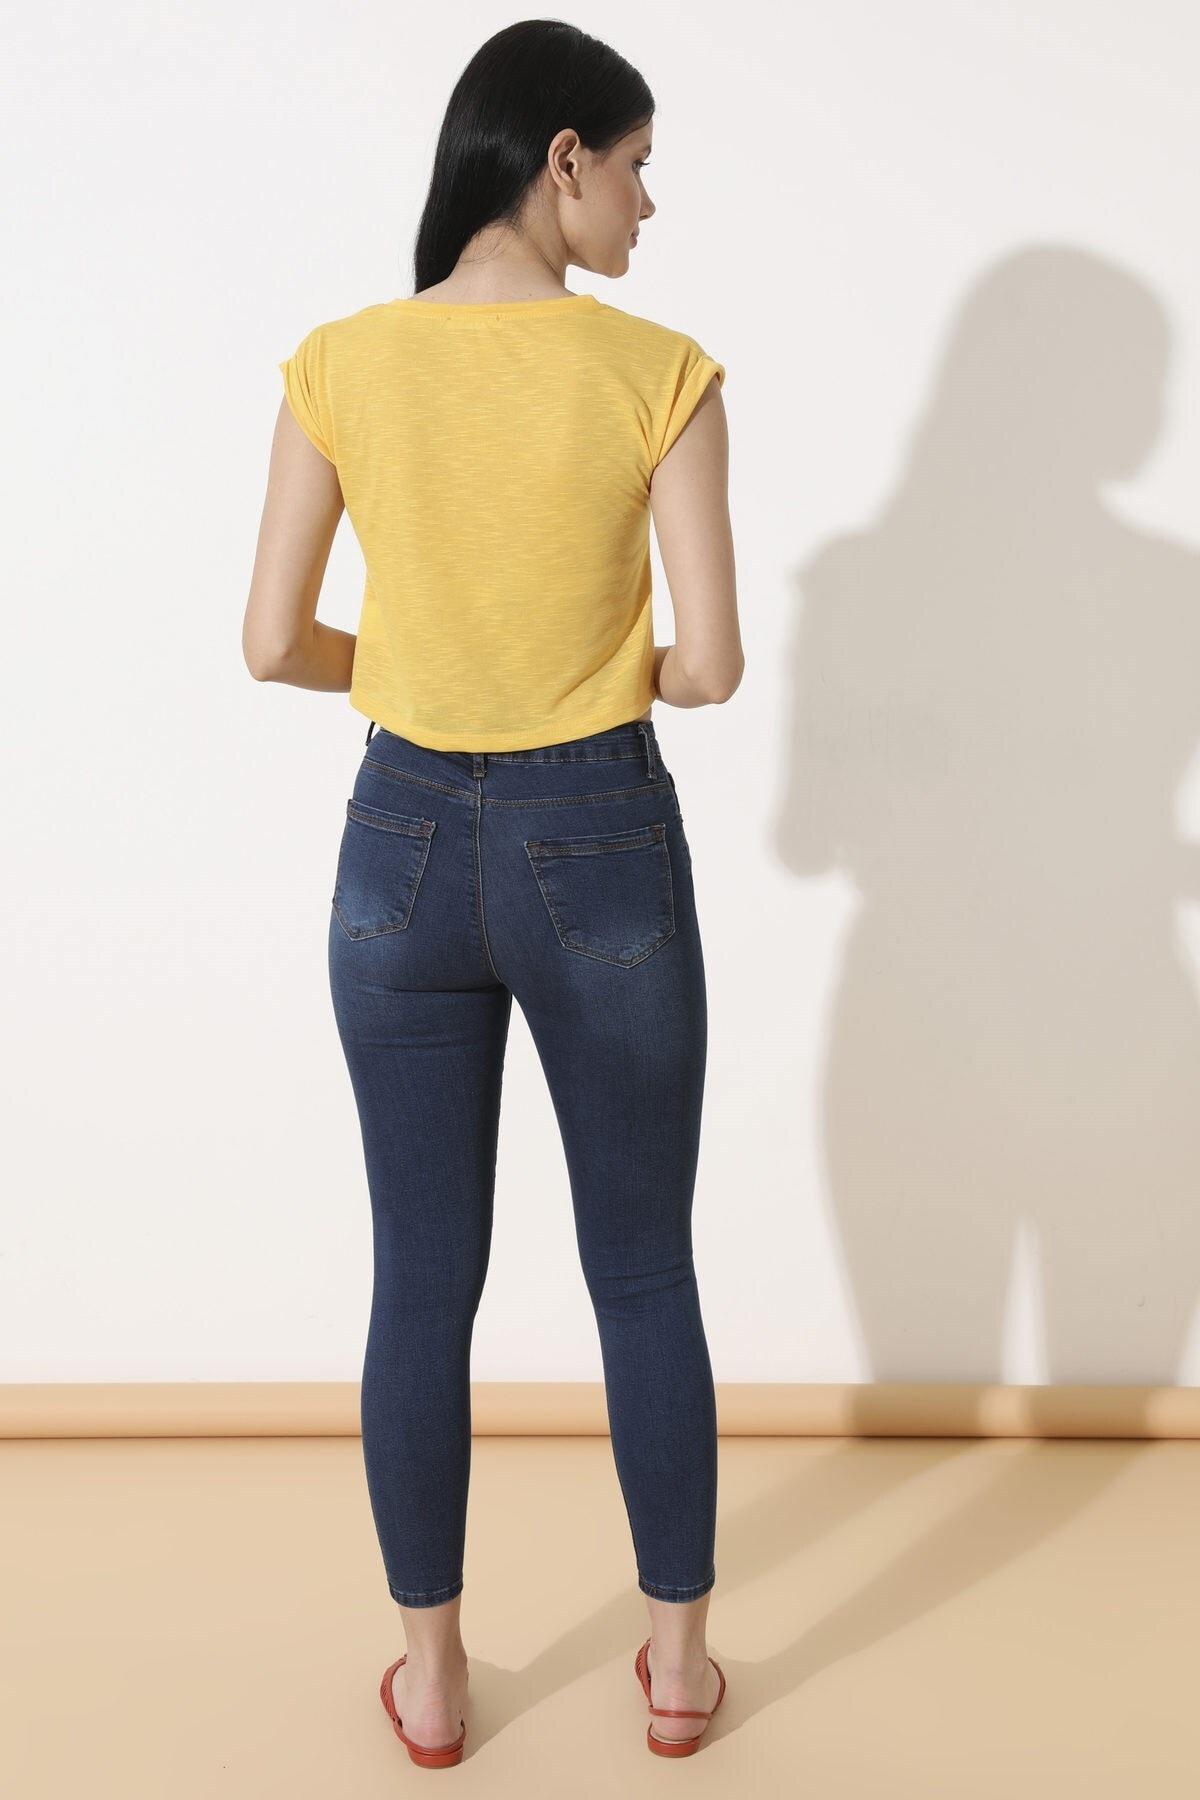 Arma Life Kadın Çağla Tint Yüksek Bel Pantolon 110-0Yb13259Ptl 4